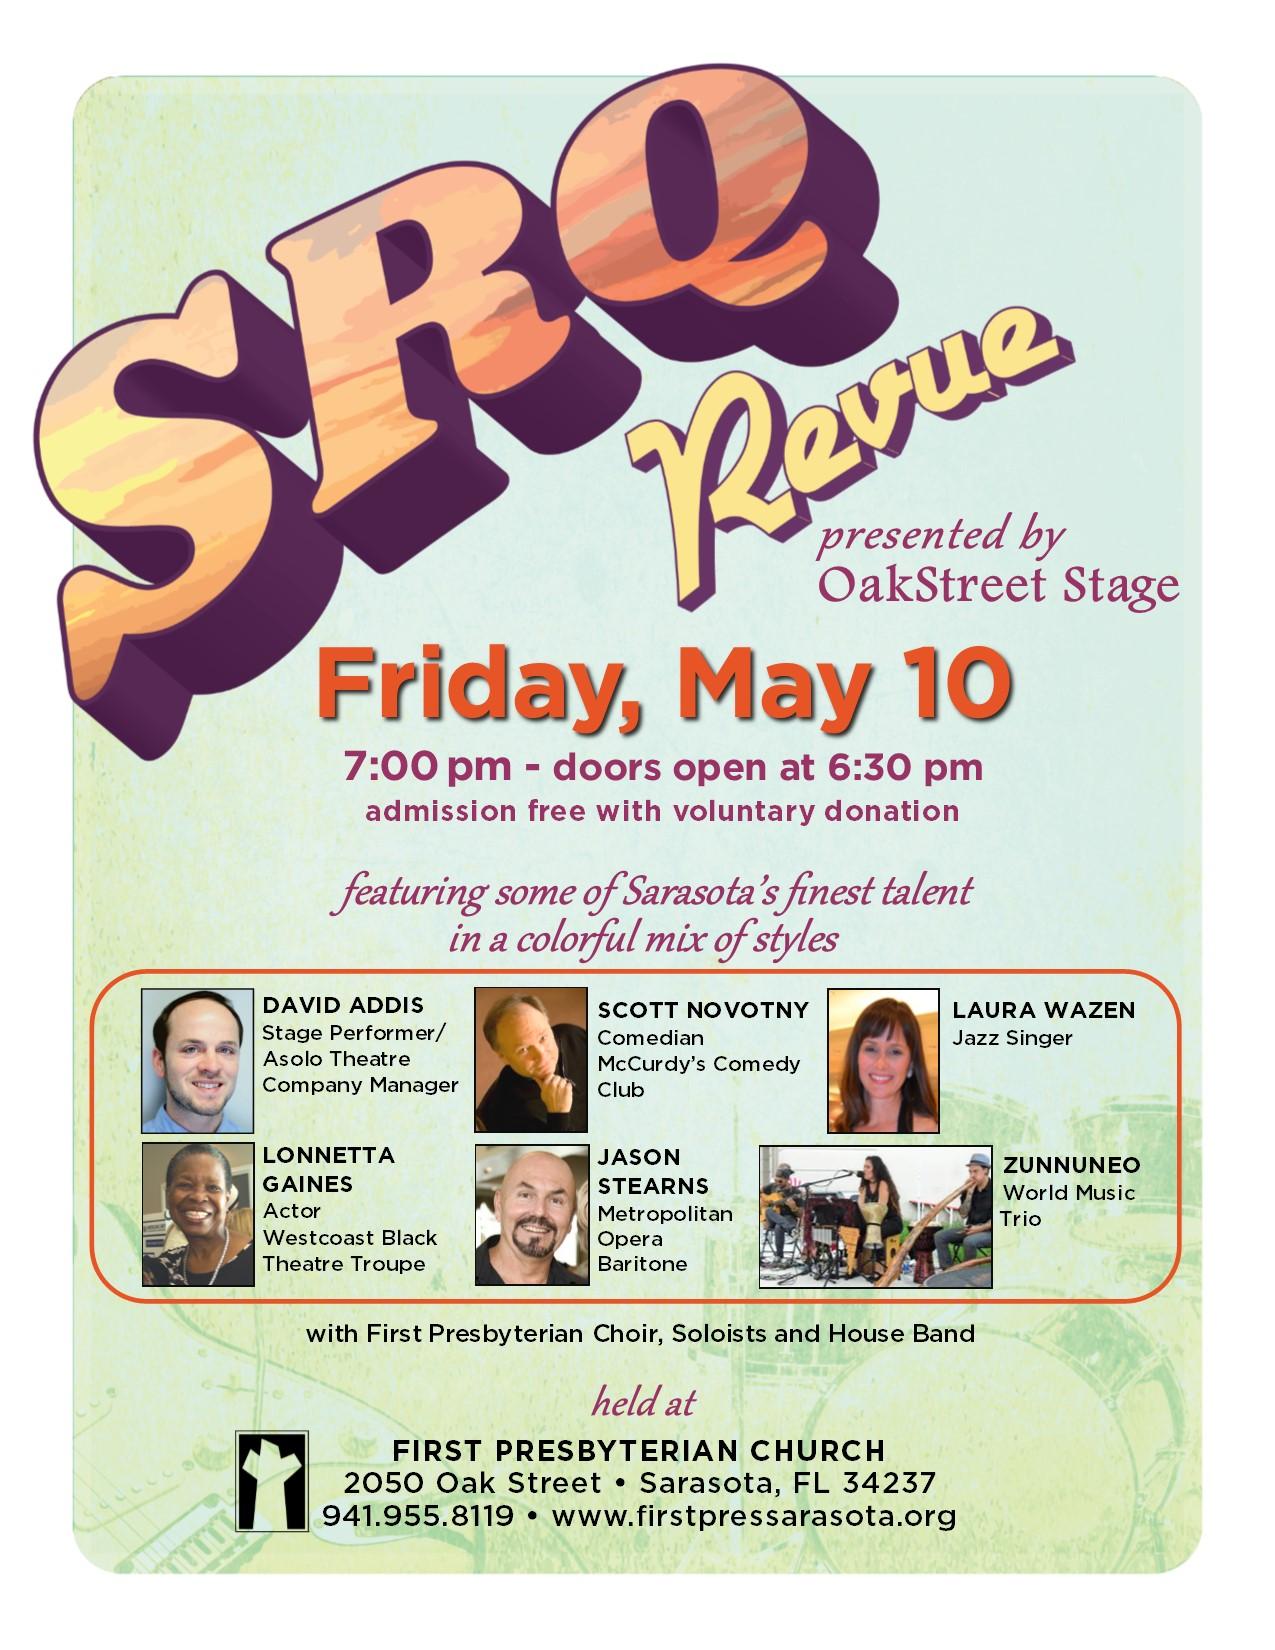 SRQ Revue Flyer (8.5 x 11)_05-10-2019.jpg